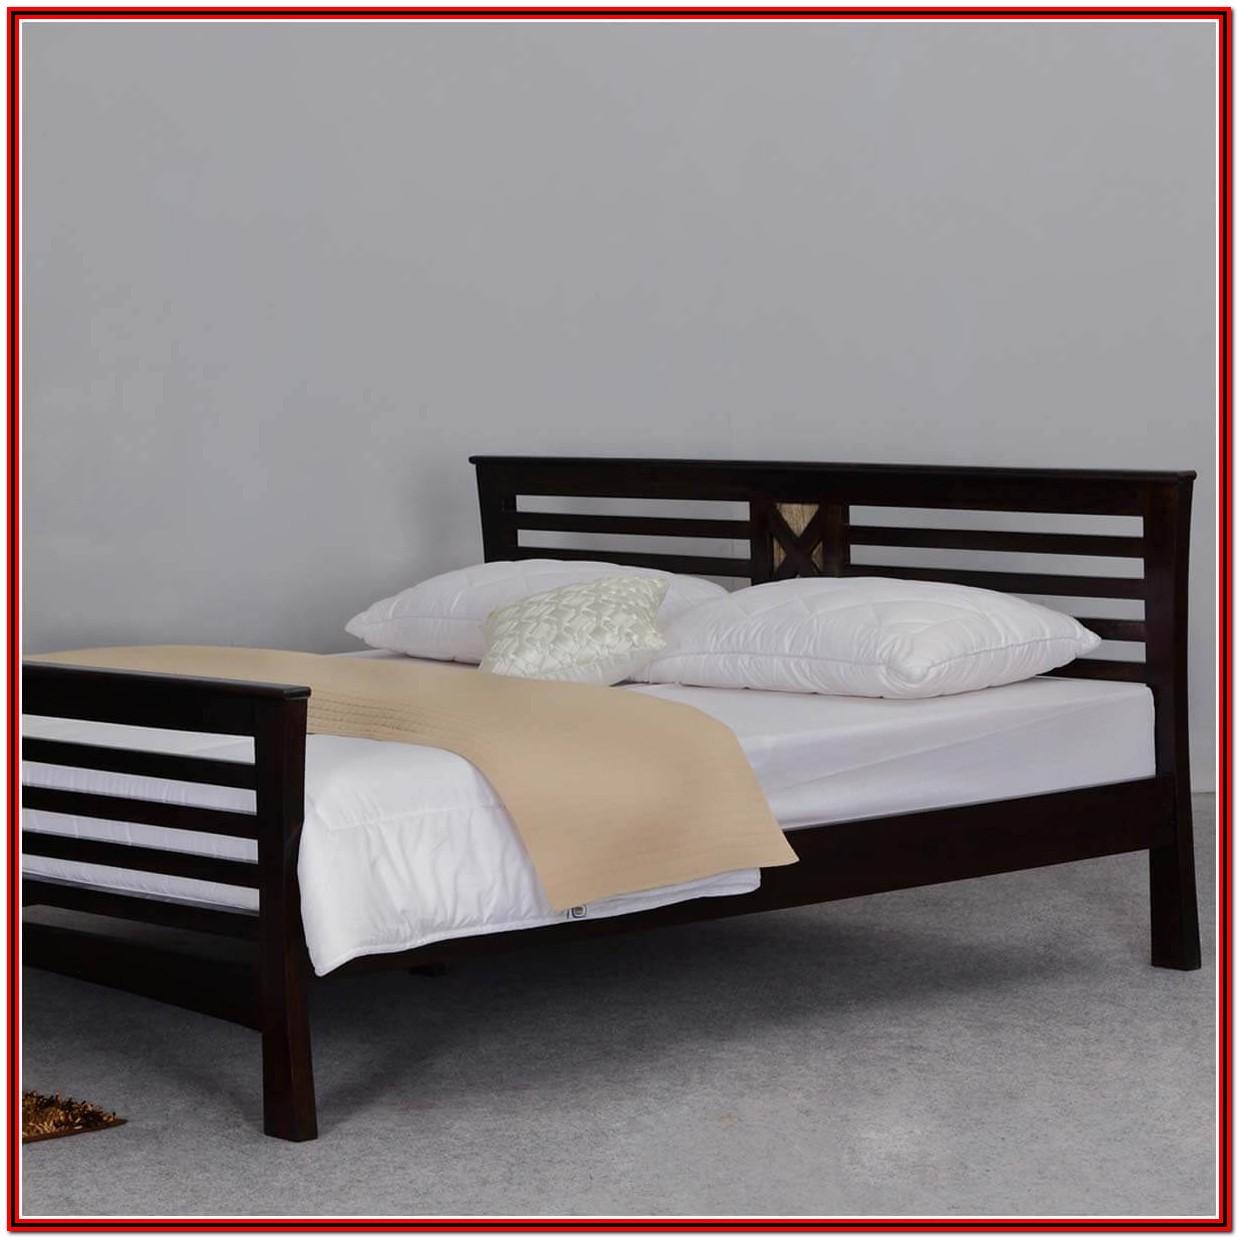 Bed Frame Queen Headboard Footboard